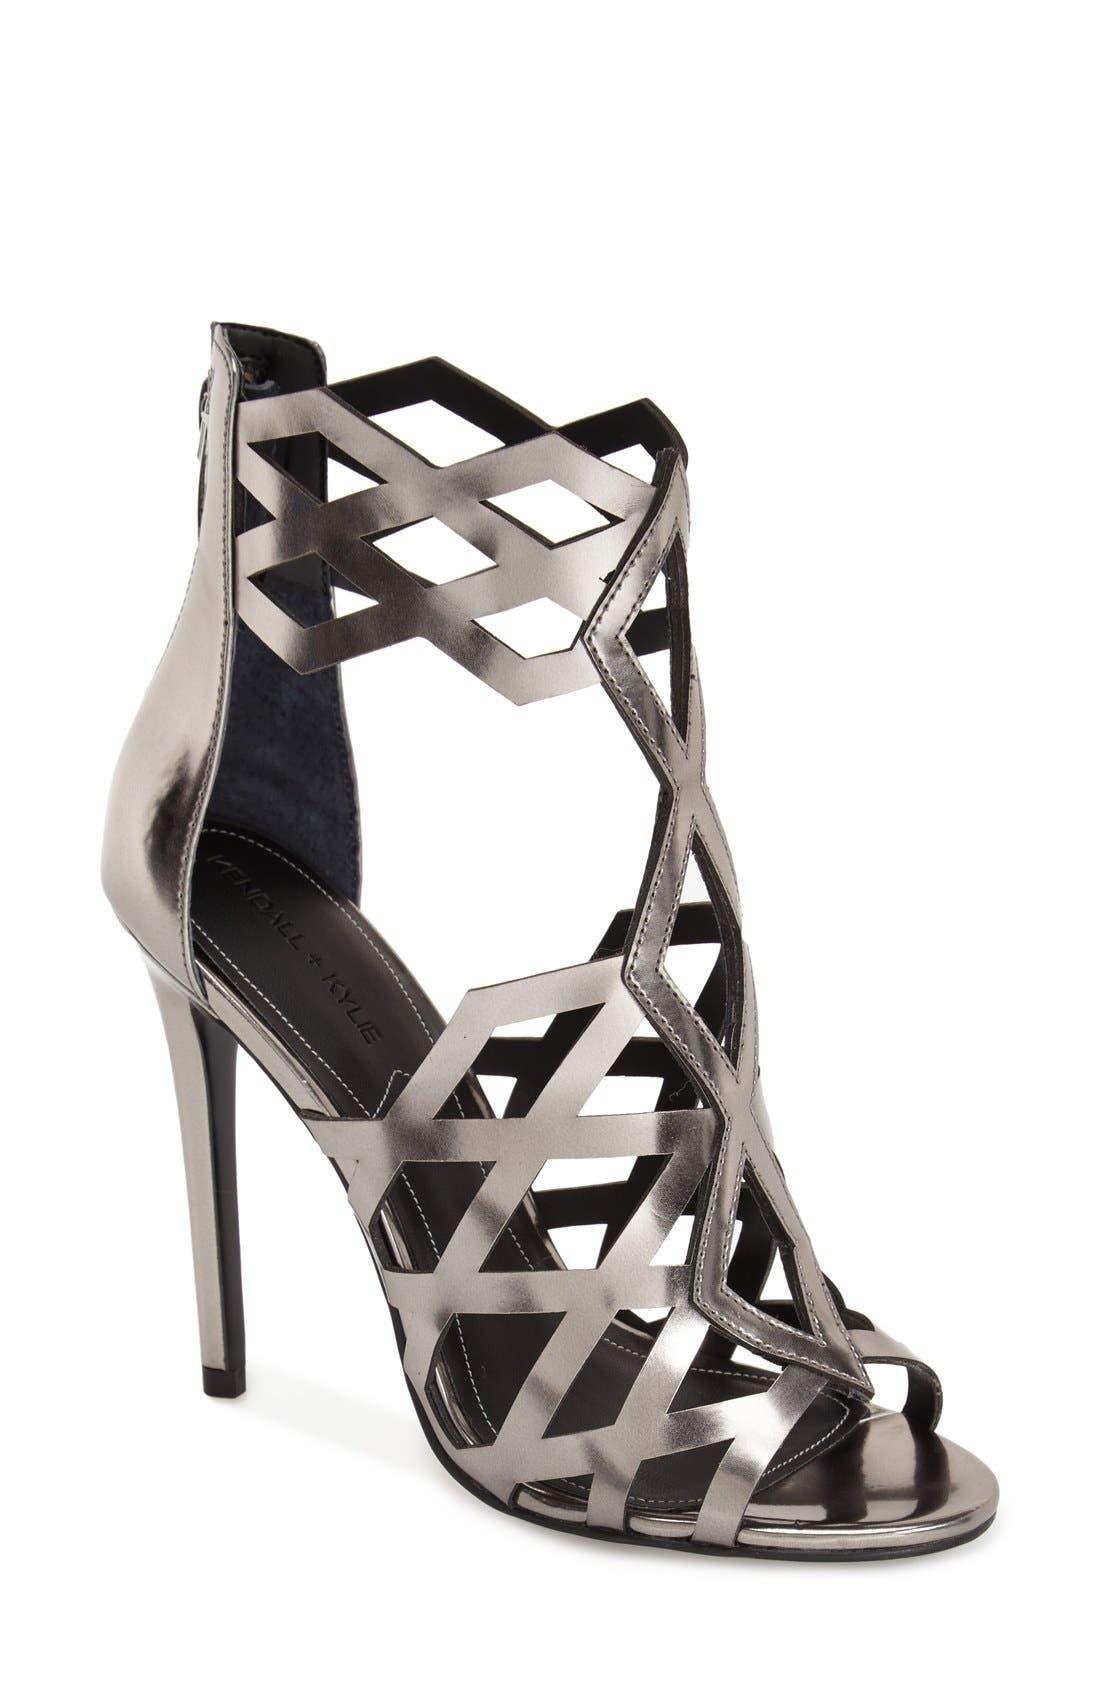 Alternate Image 1 Selected - KENDALL + KYLIE 'Elena' Cutout Sandal (Women)